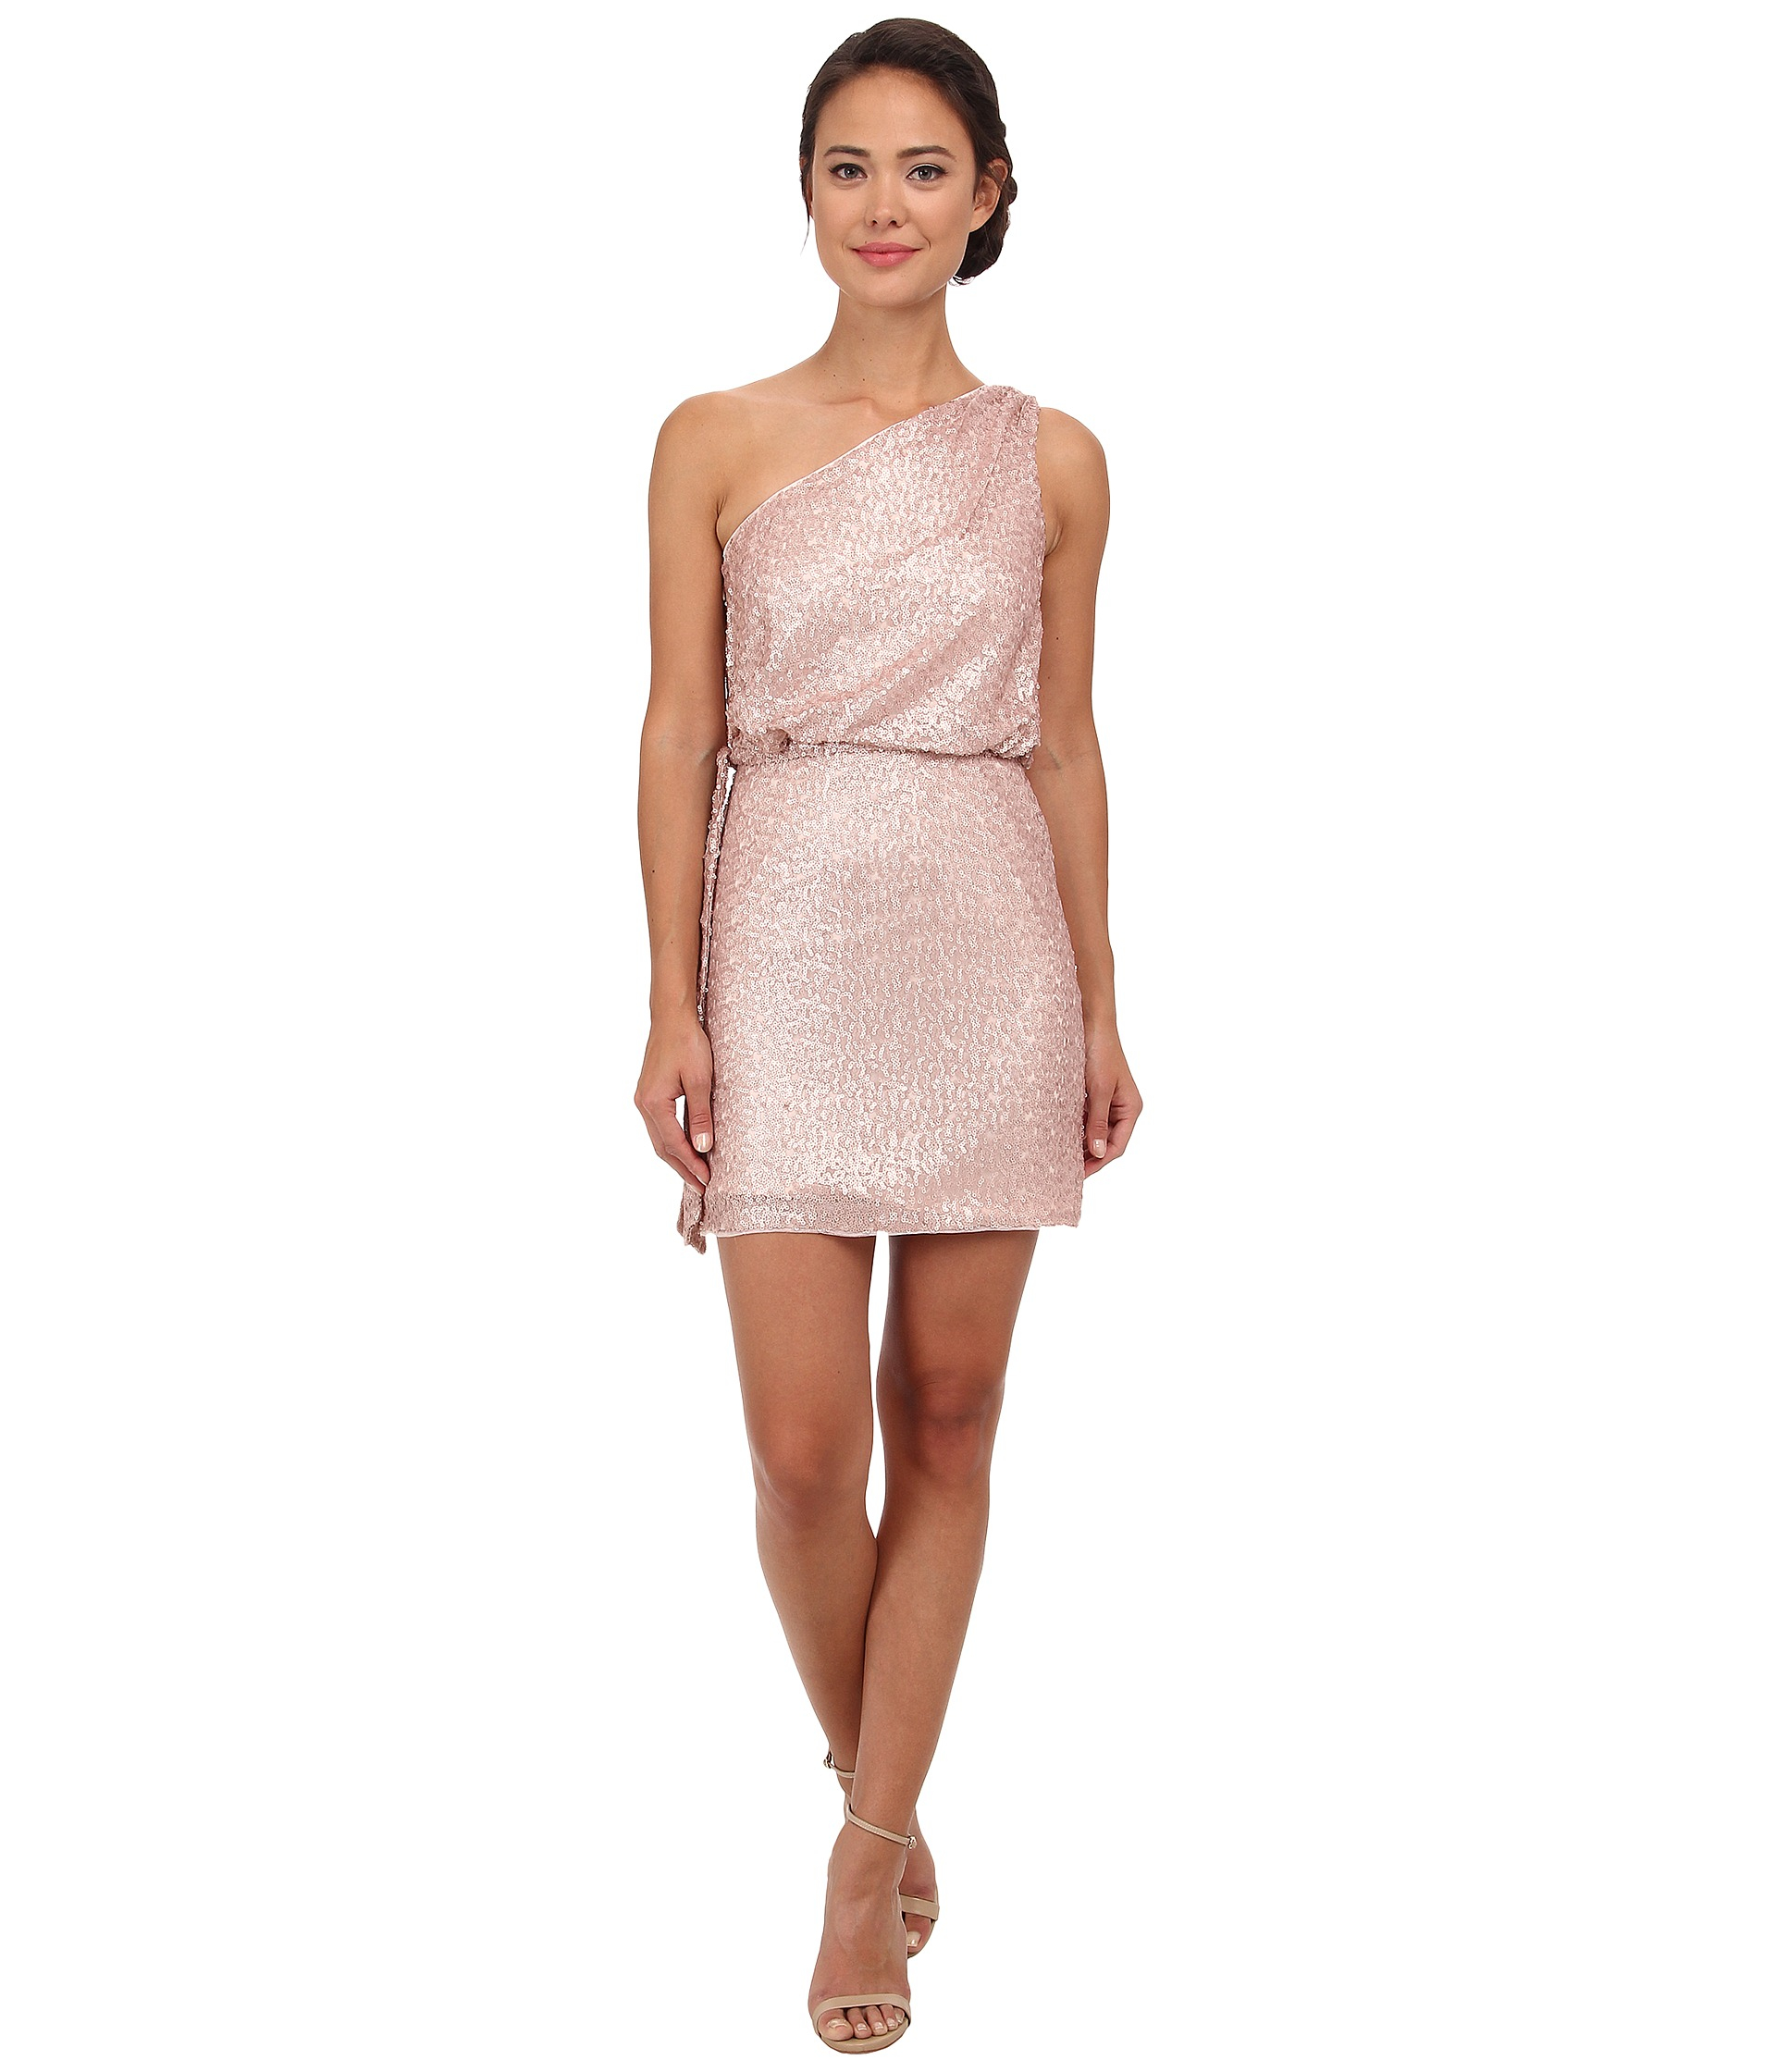 Aidan mattox One Shoulder Sequin Cocktail Dress in Pink  Lyst